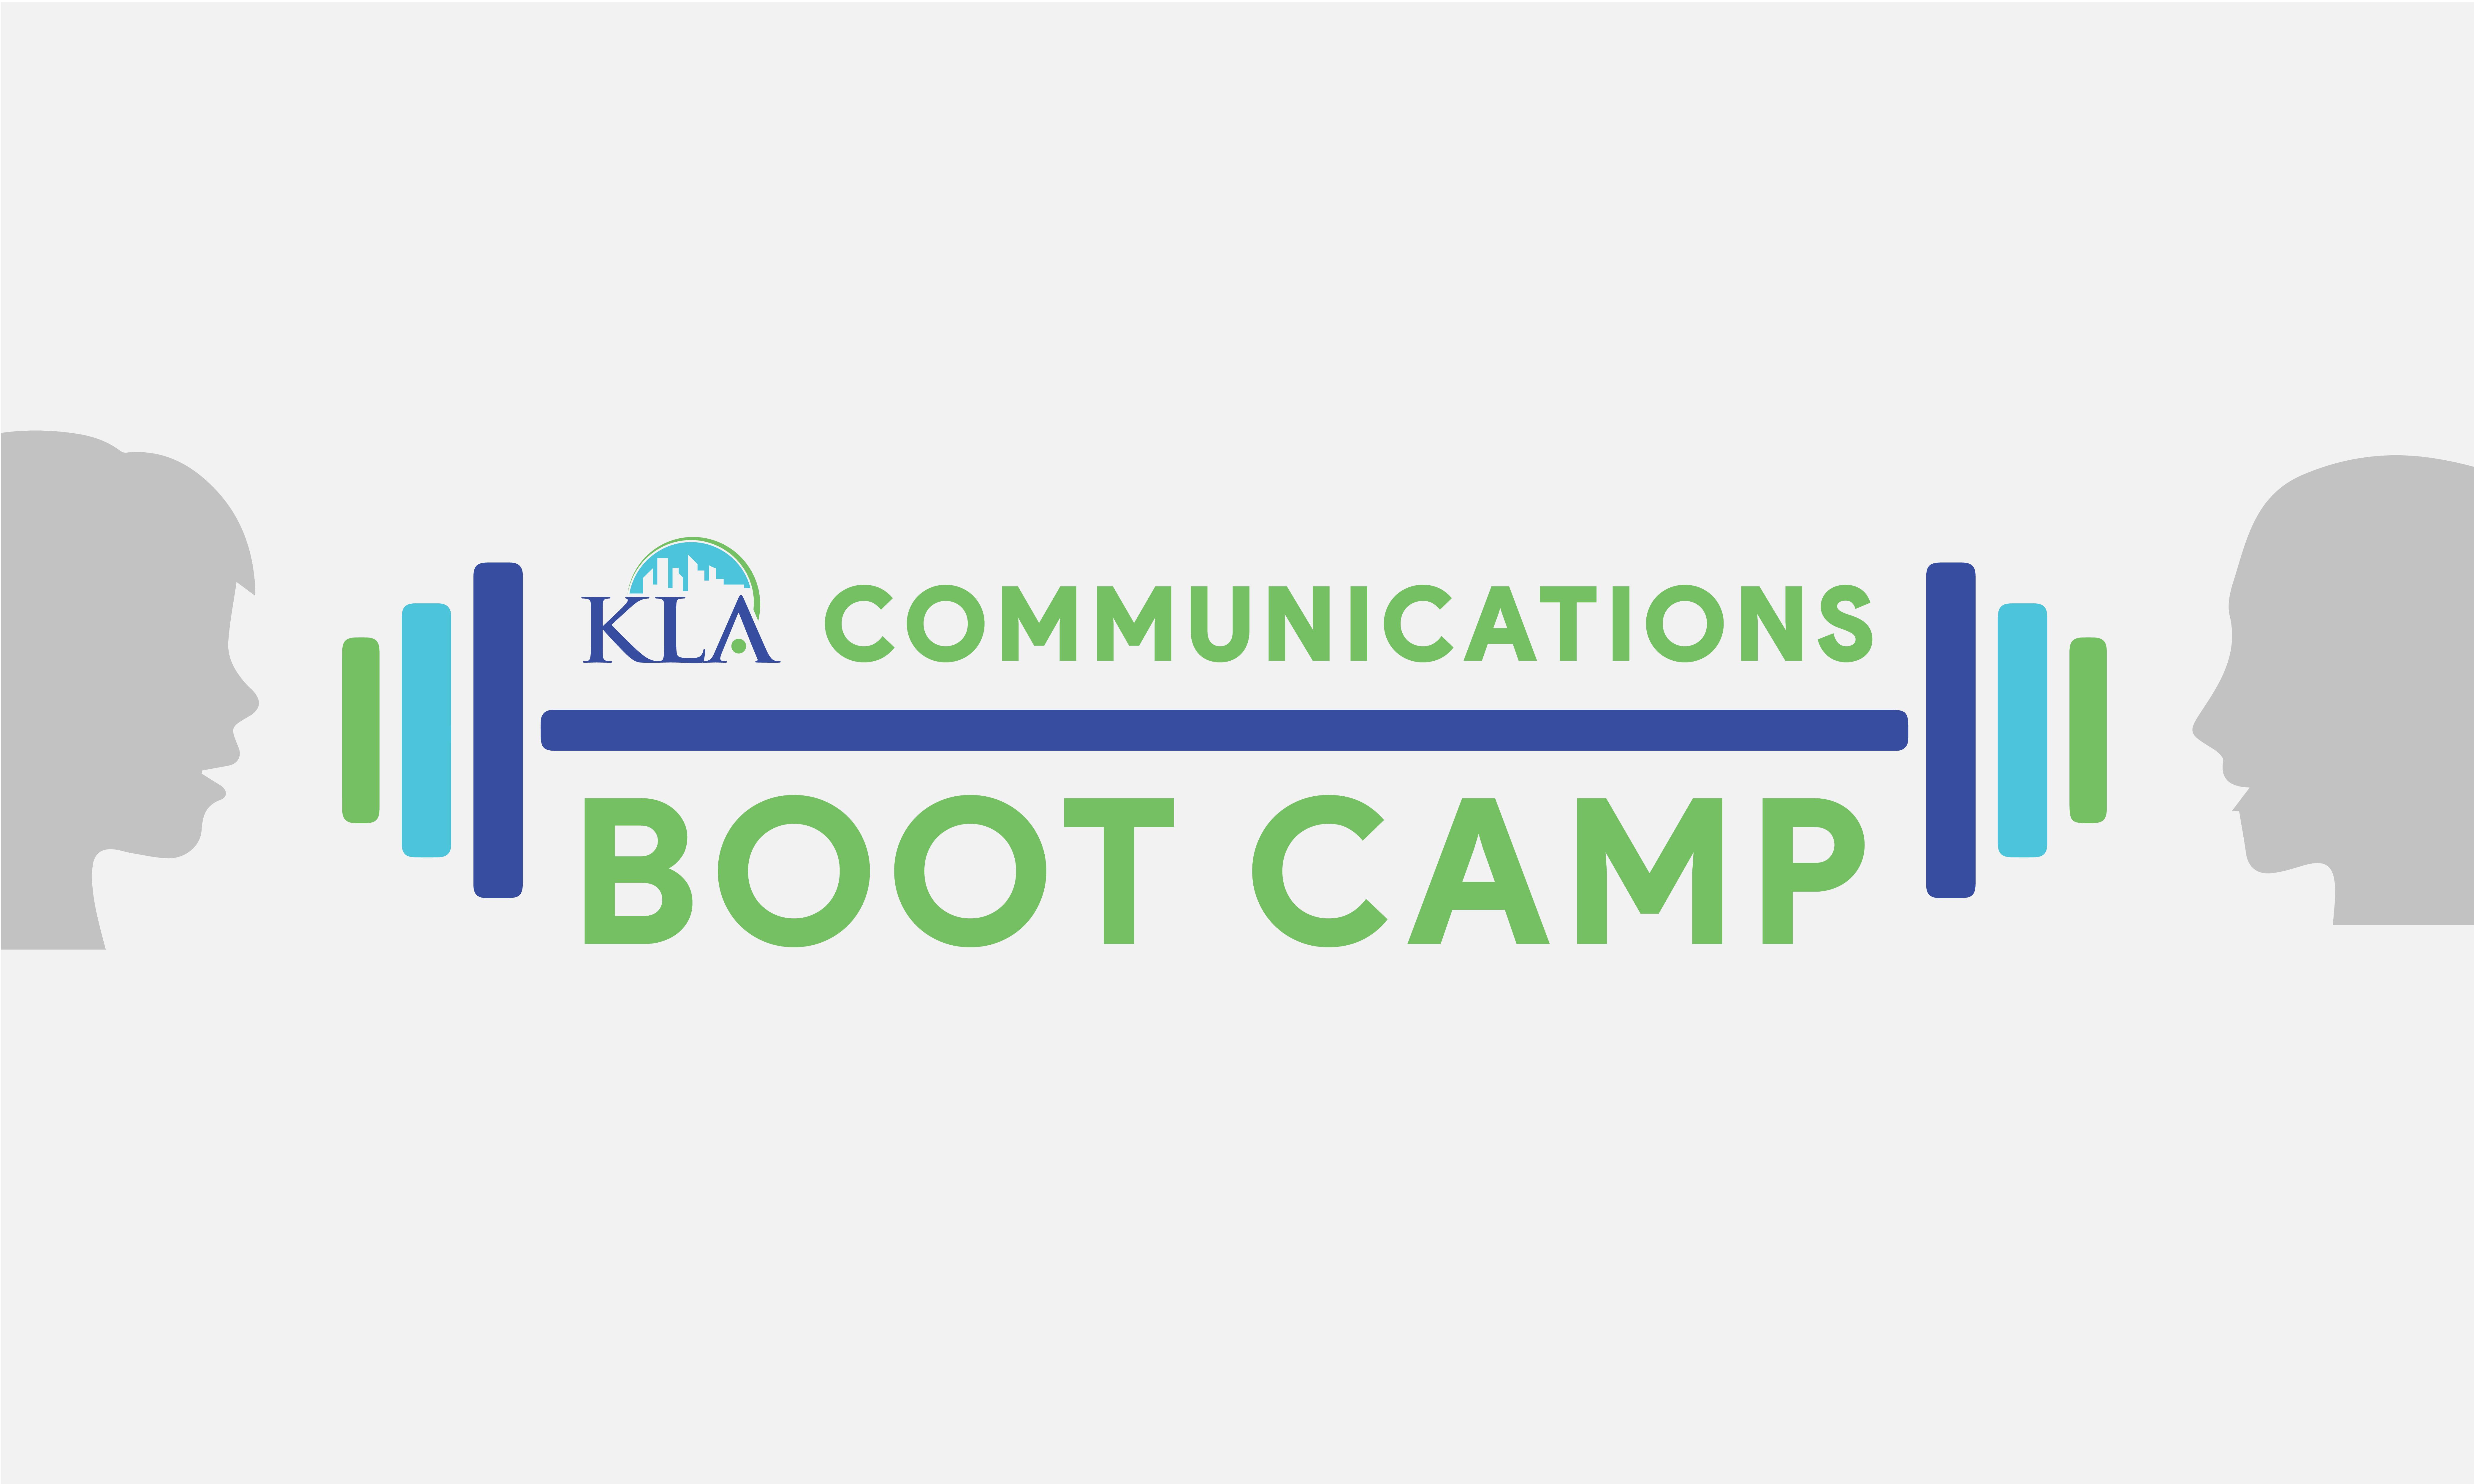 KLA_Bootcamp_Main_Graphic